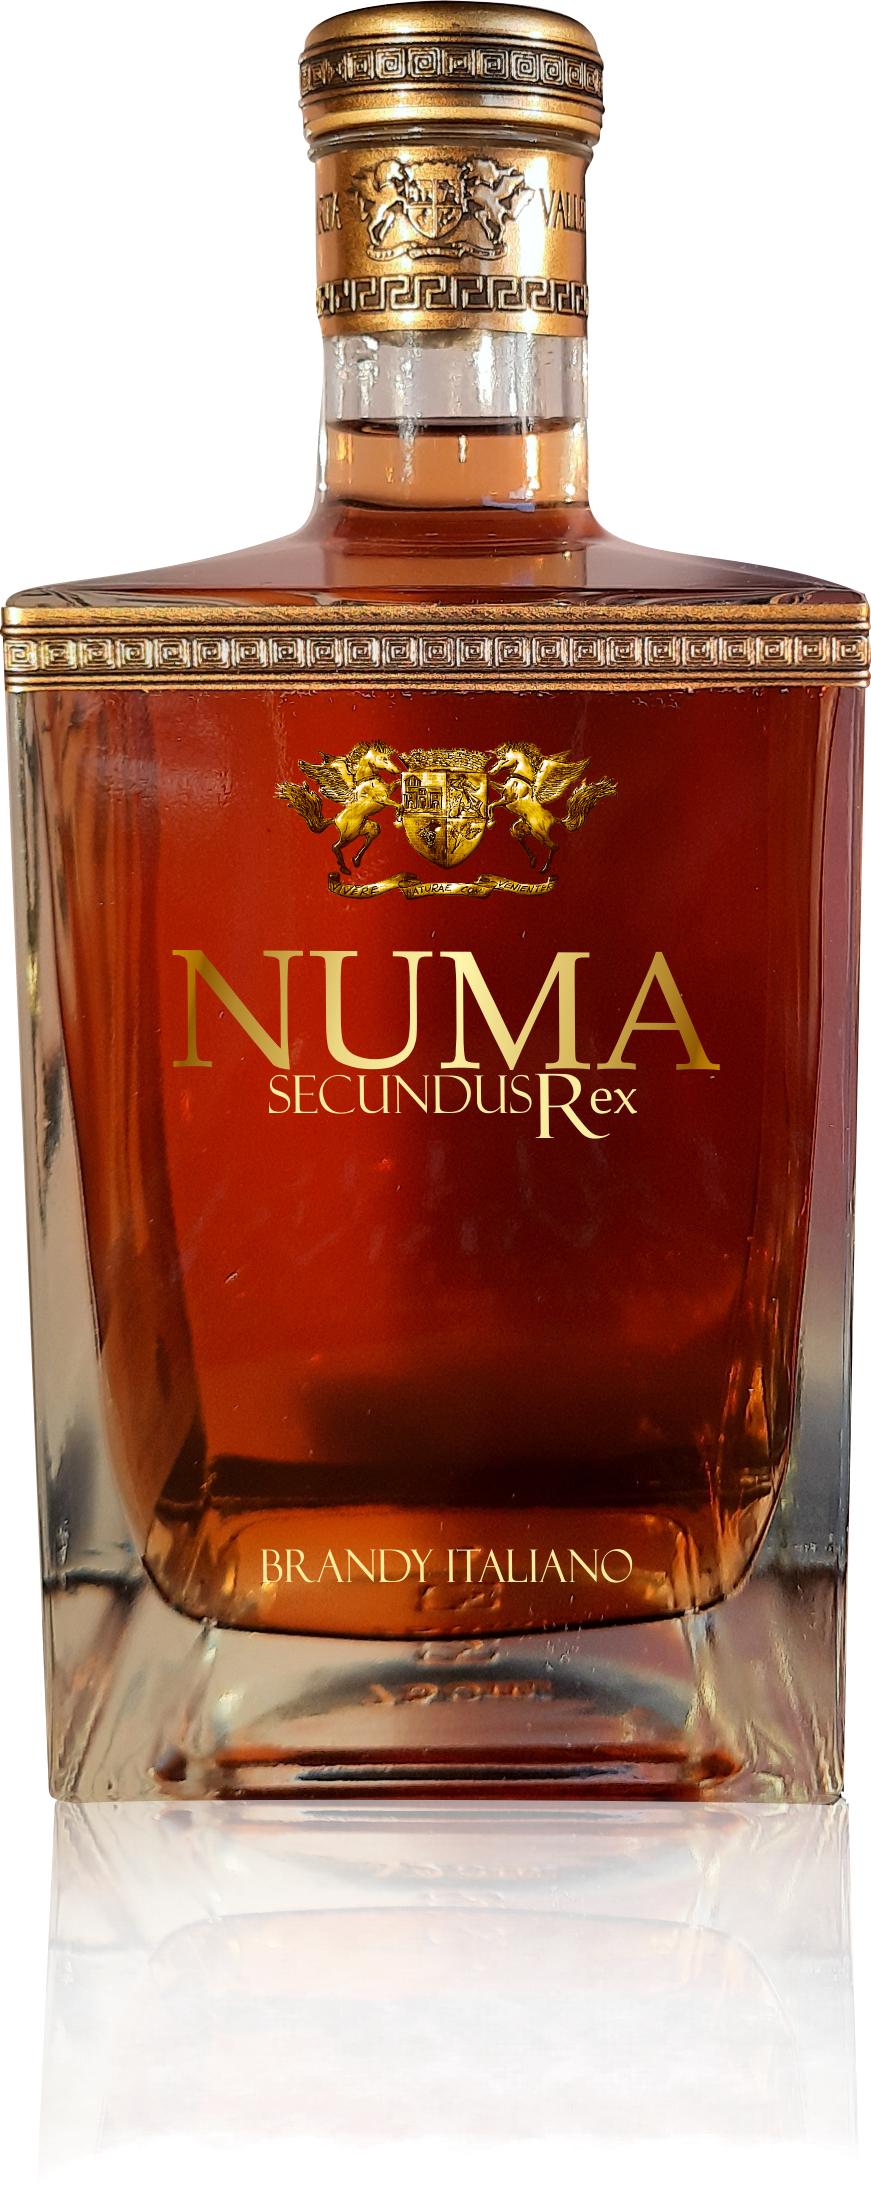 brandy italiano numa secundus rex